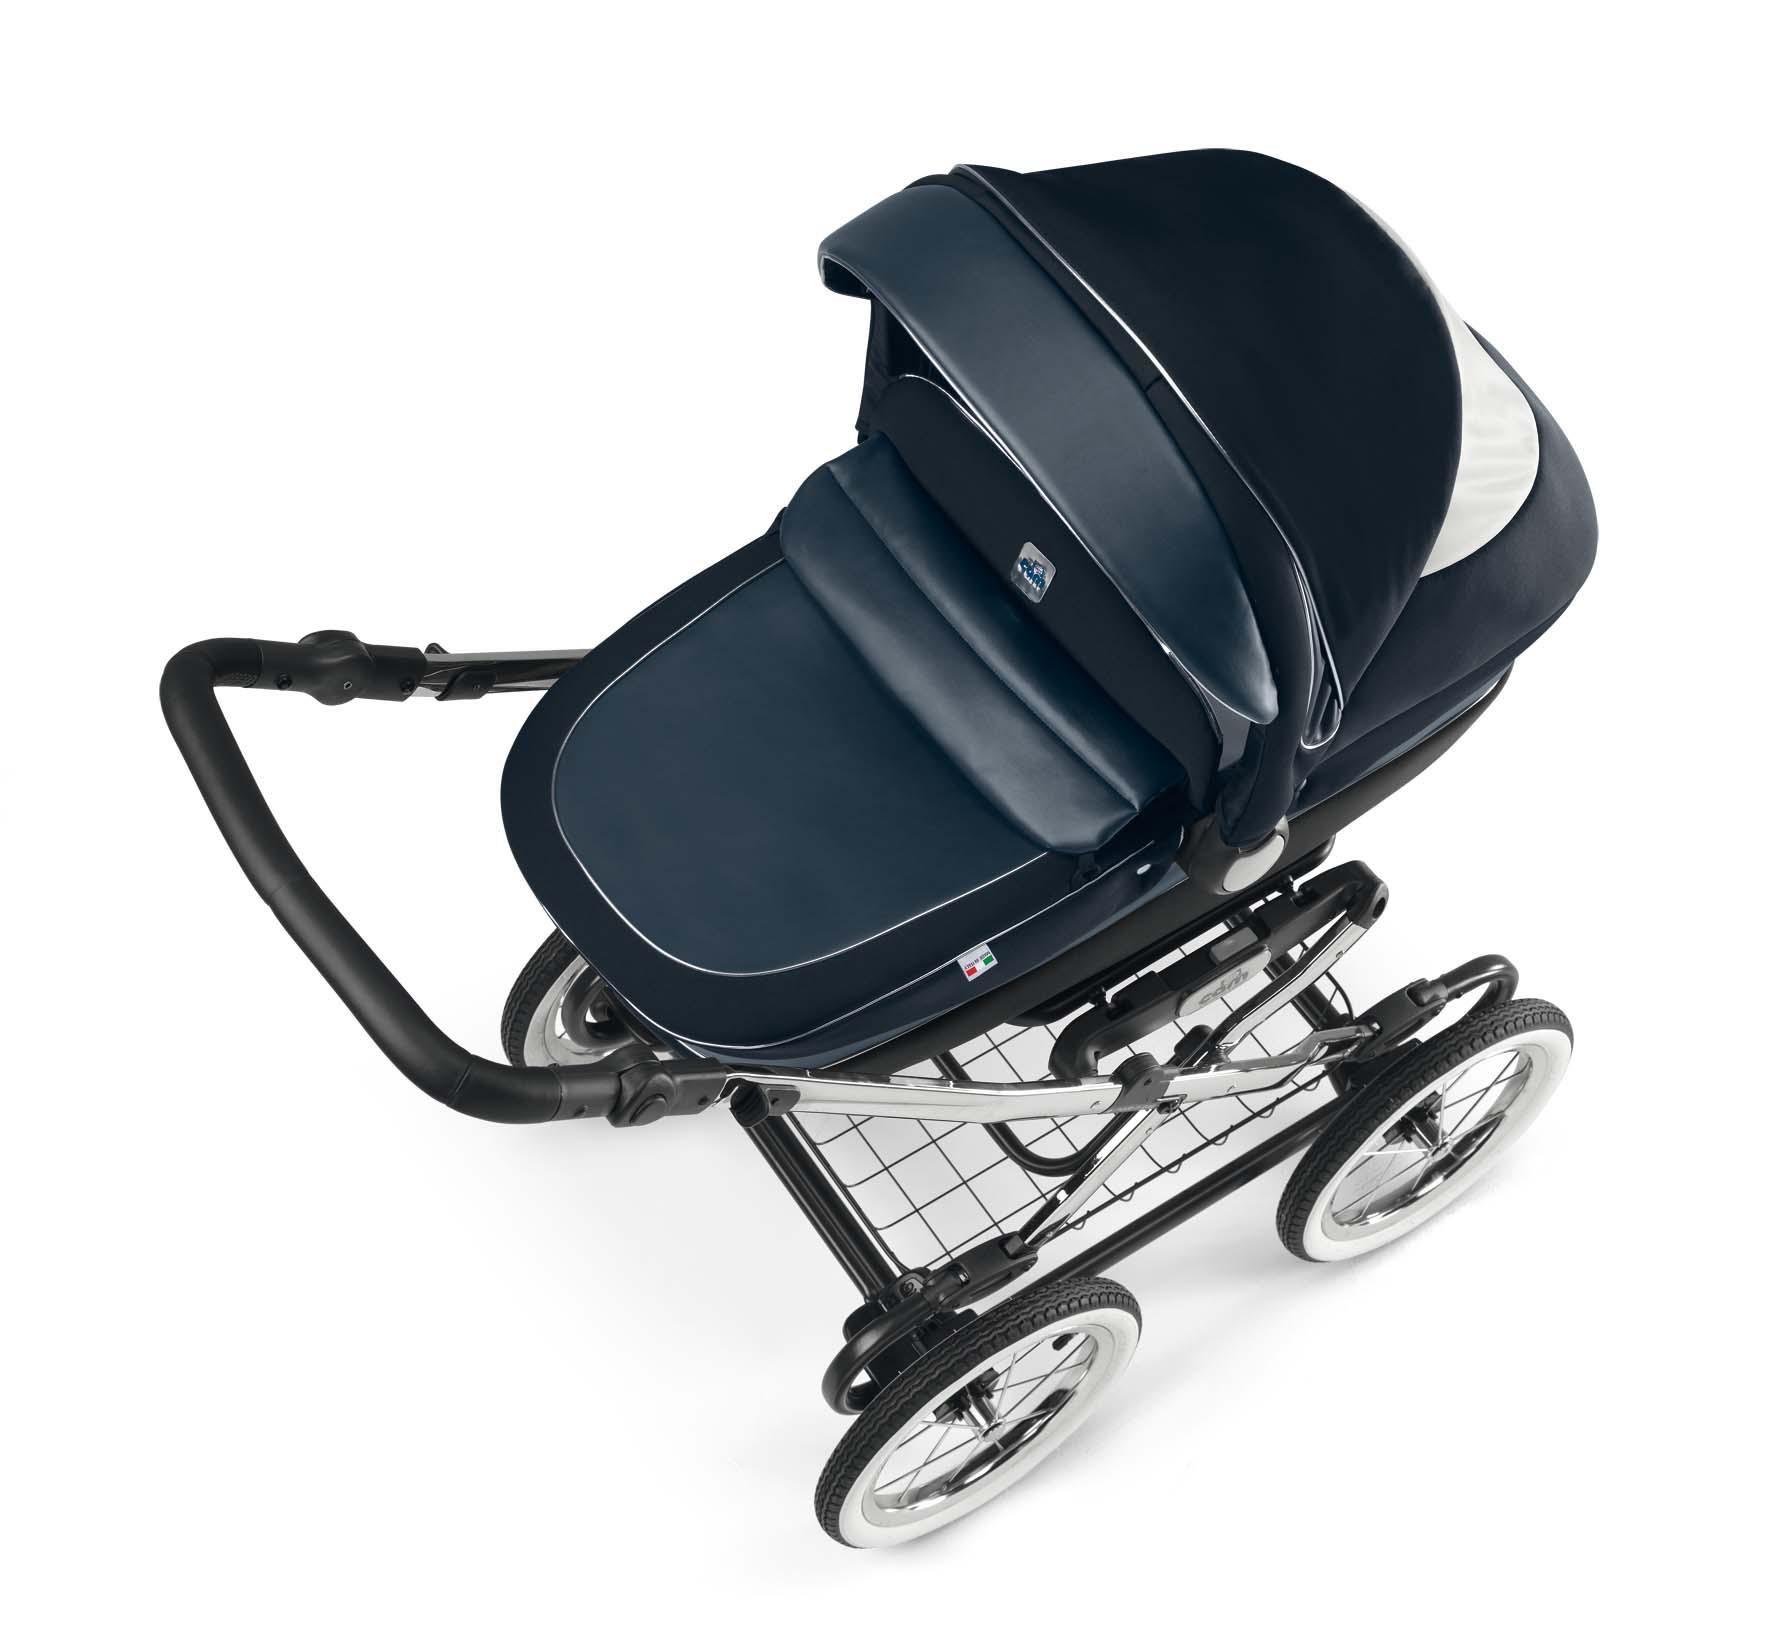 Cam Kinderwagen Linea Classy Tris blue by CAMSPA Italy für Baby und Kind Retro…